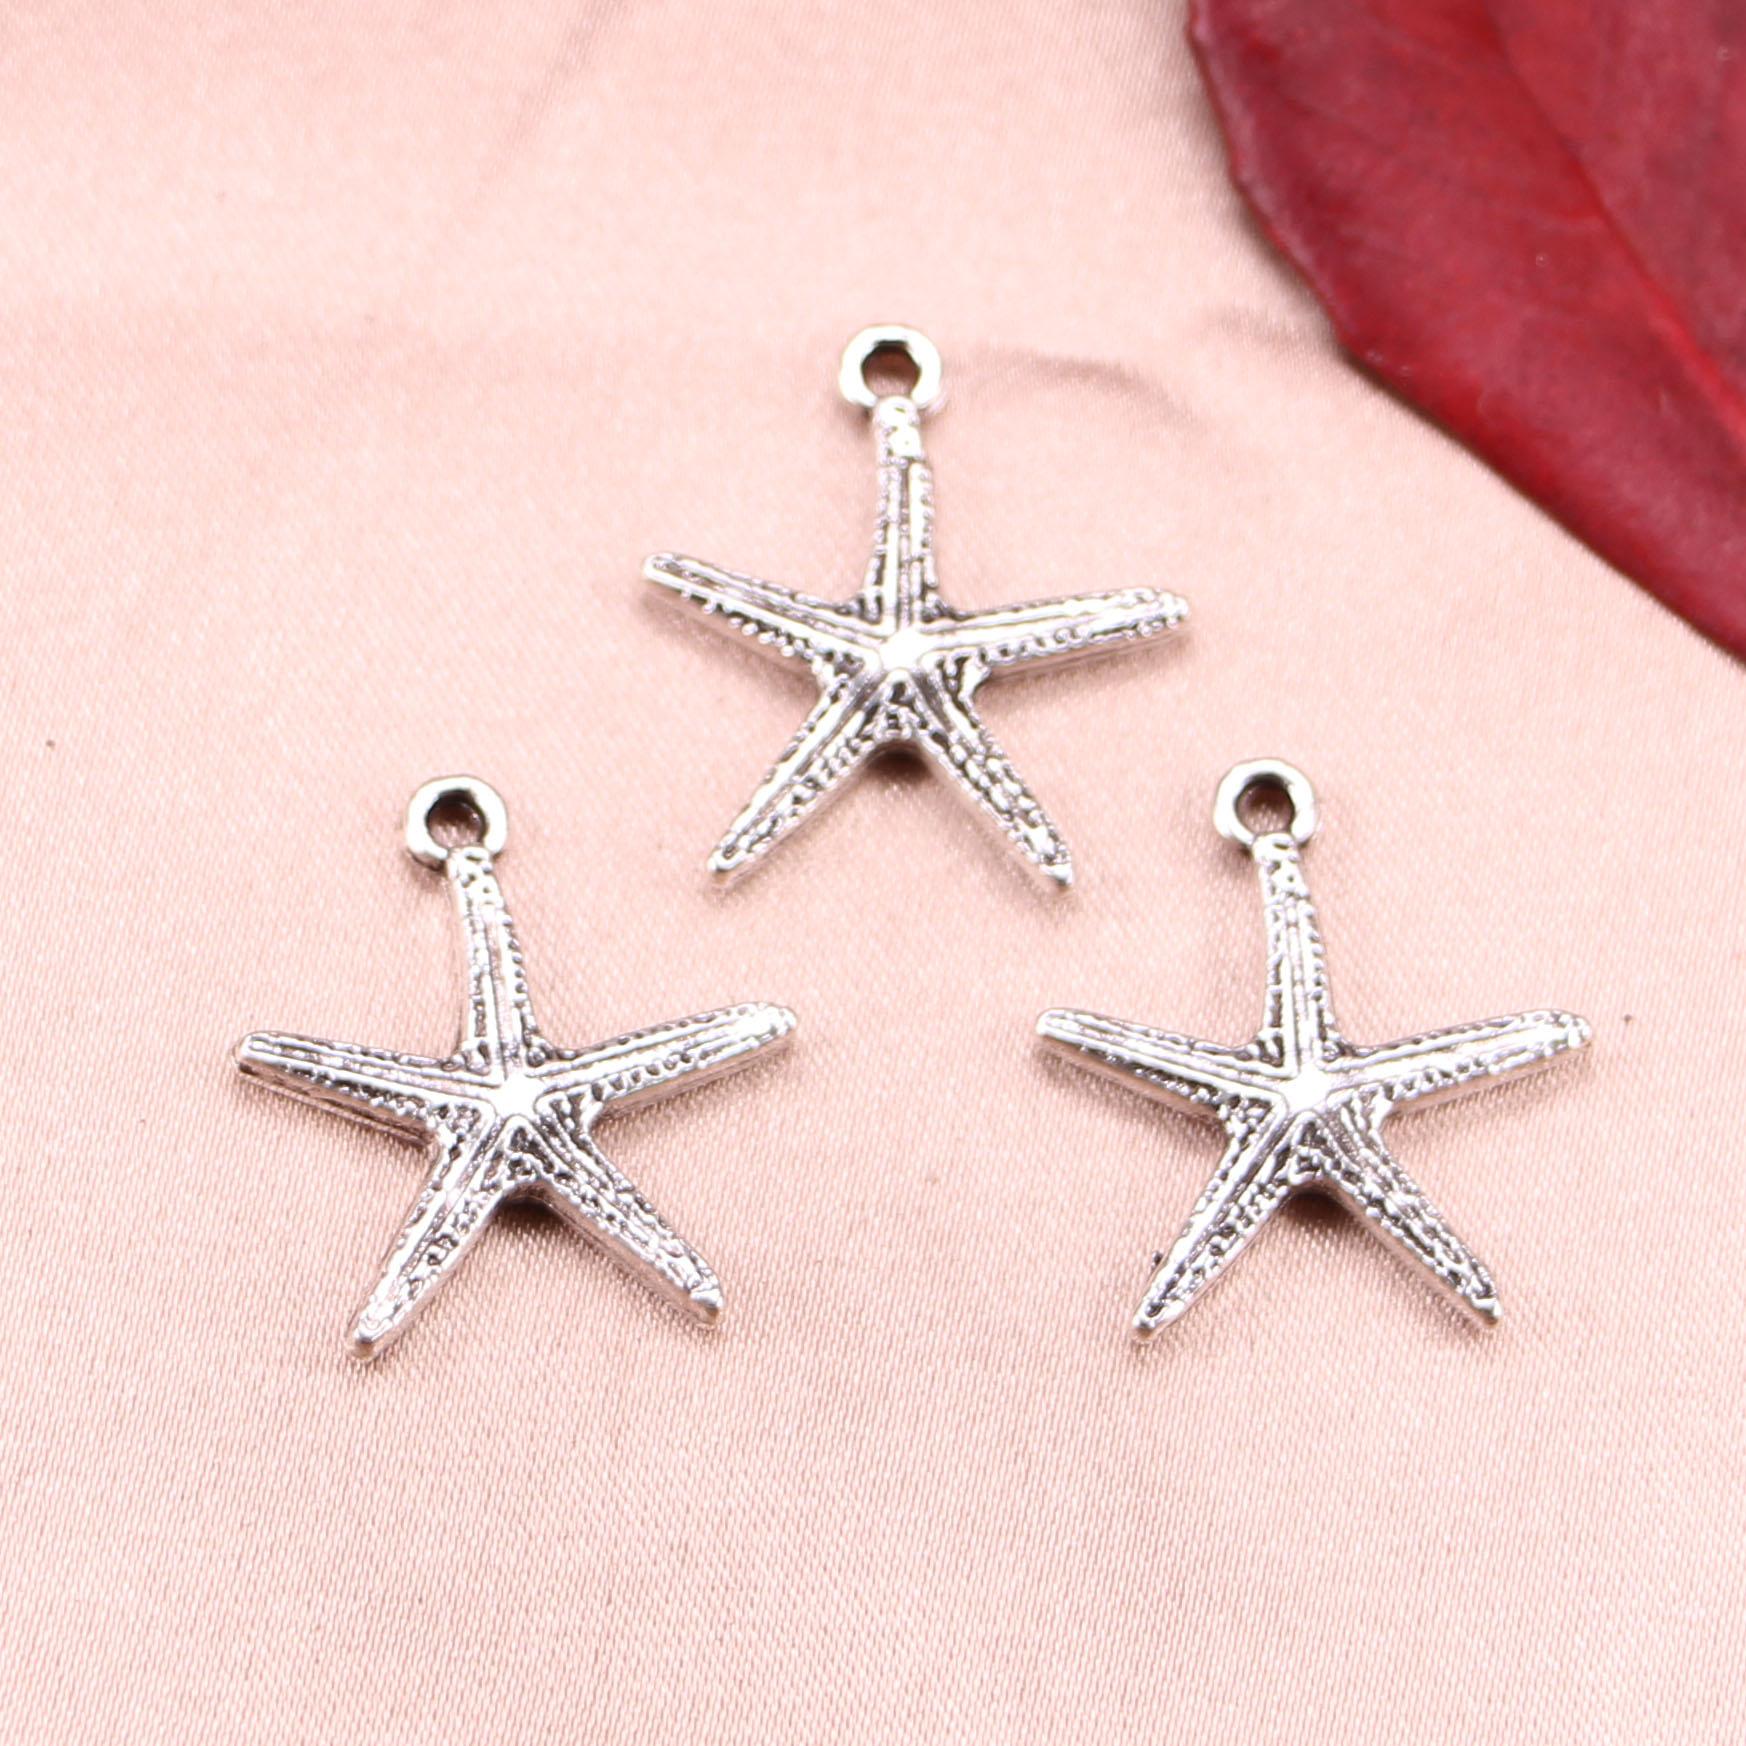 30pcs Starfish Beads Tibetan Silver Charms Pendant Fit DIY Bracelet 20*18mm